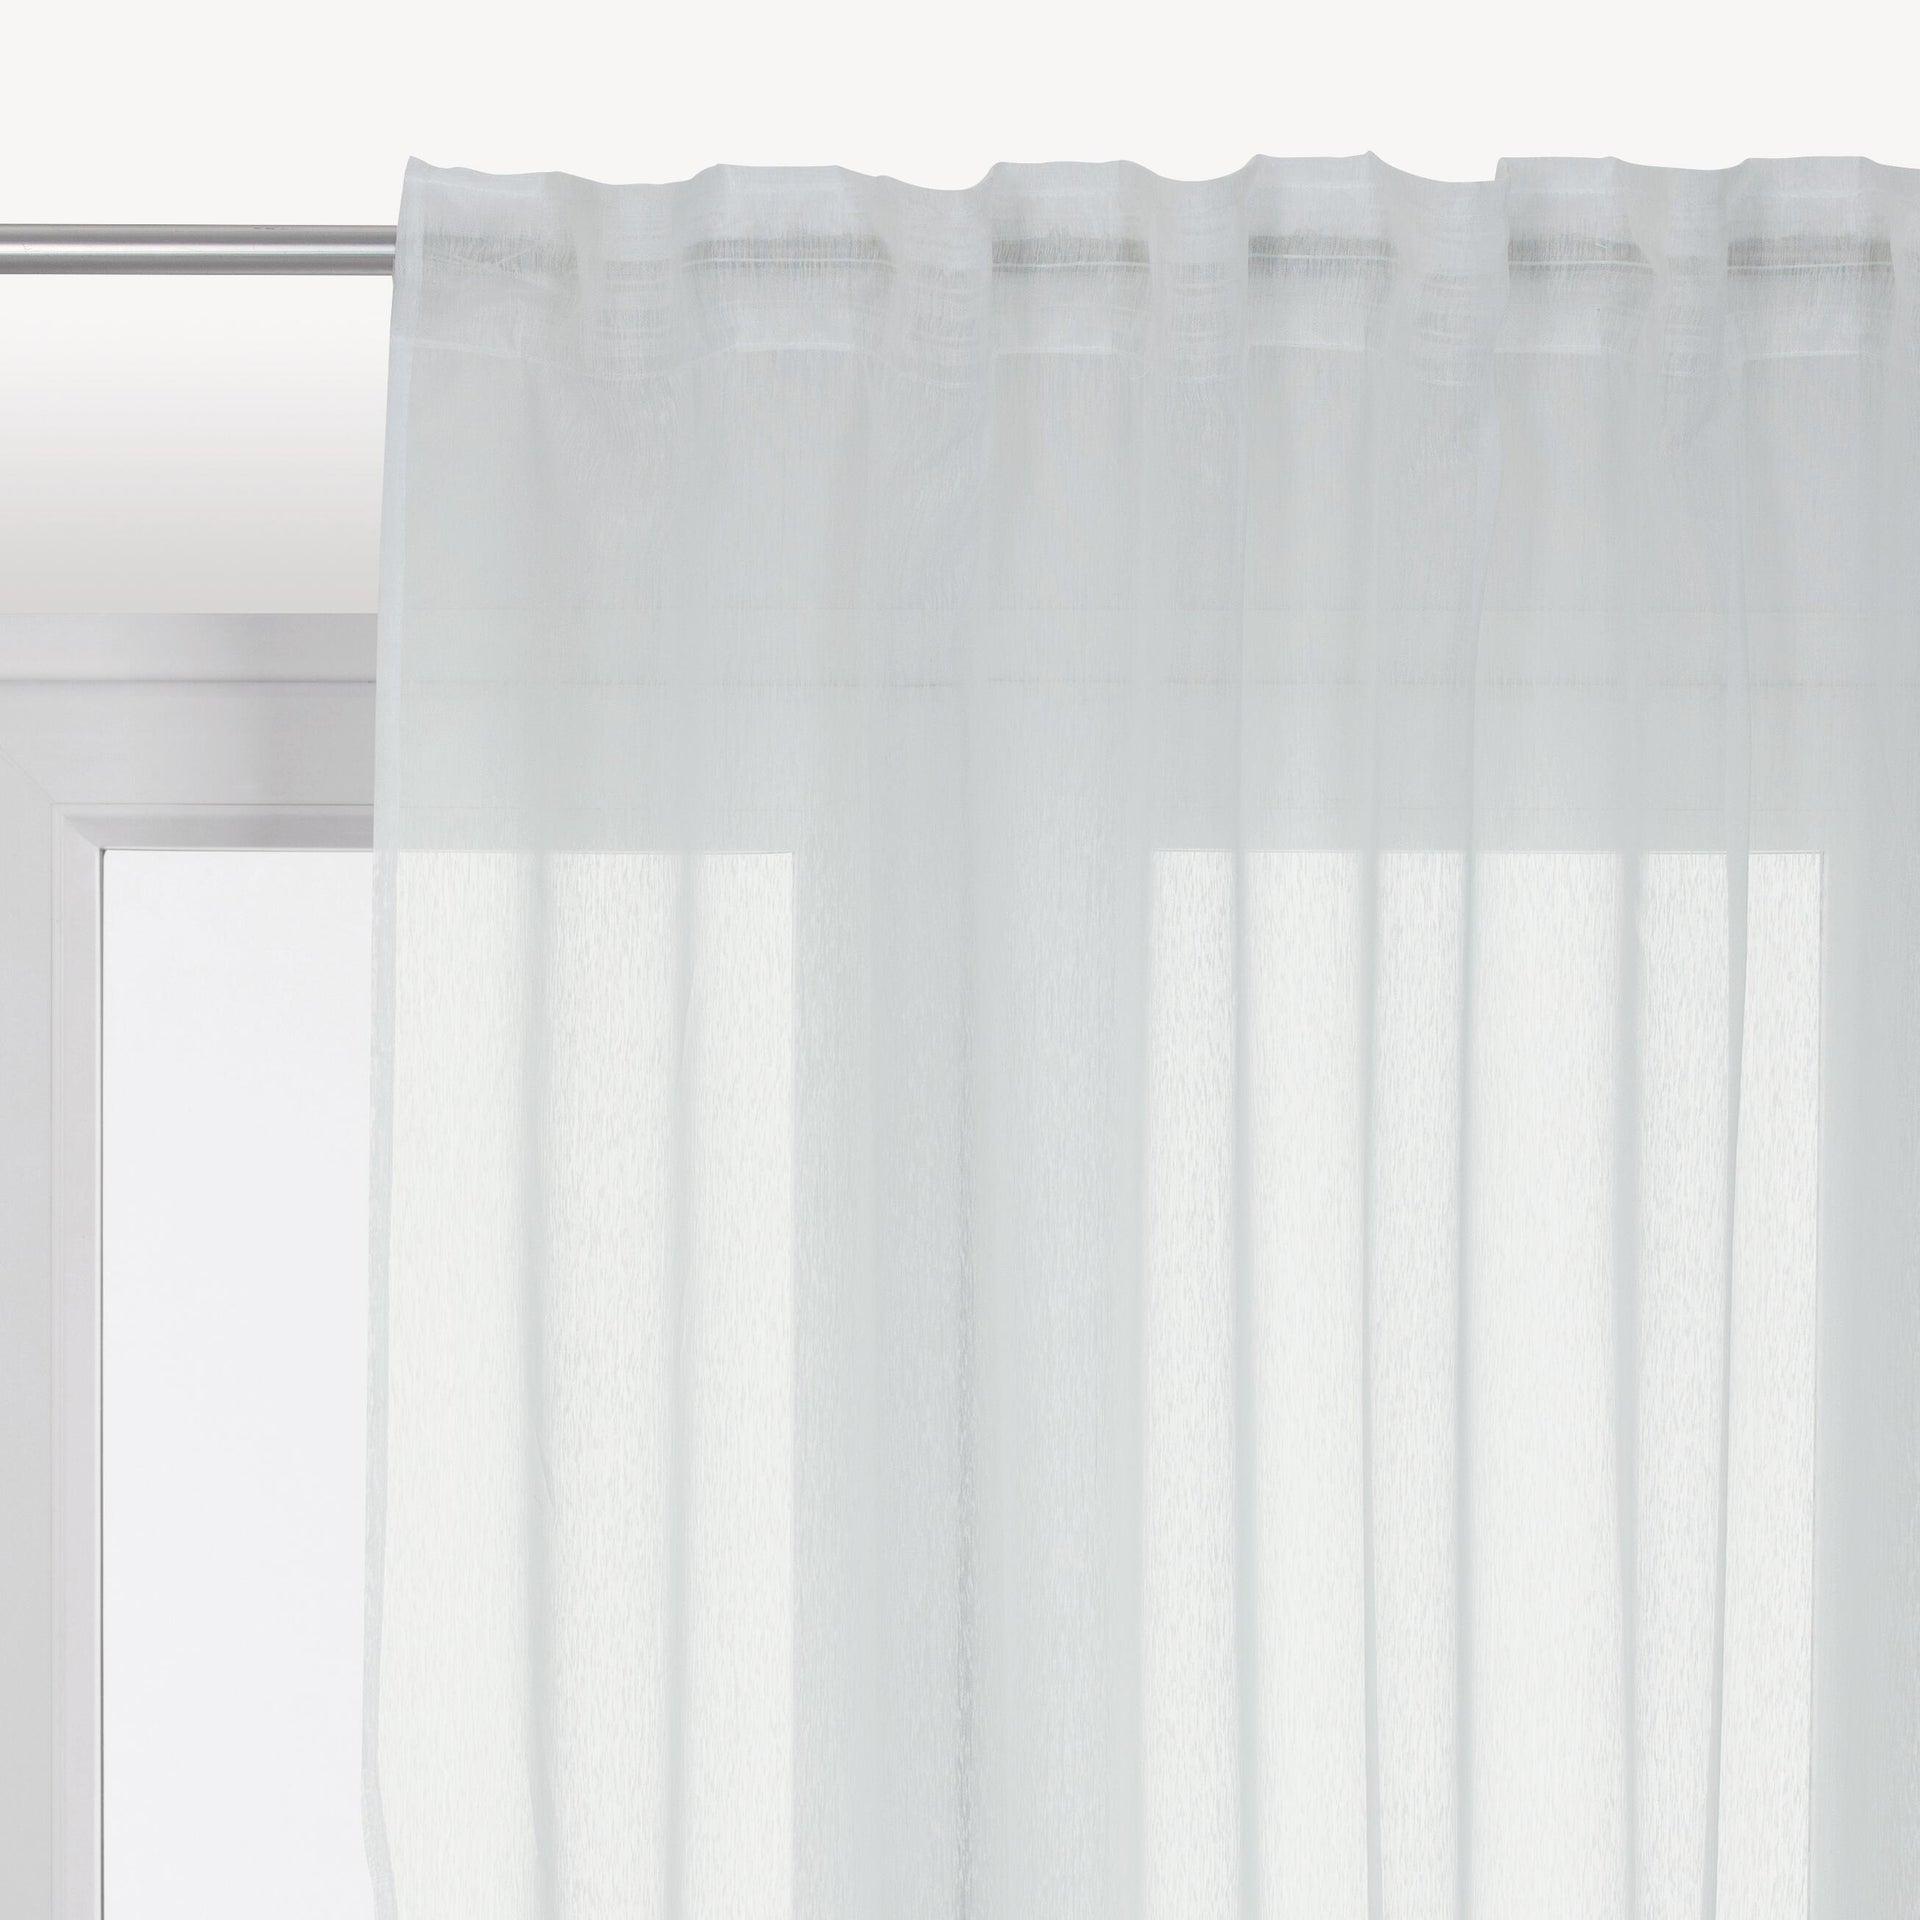 Tenda INSPIRE Softy bianco fettuccia e passanti 200 x 280 cm - 1